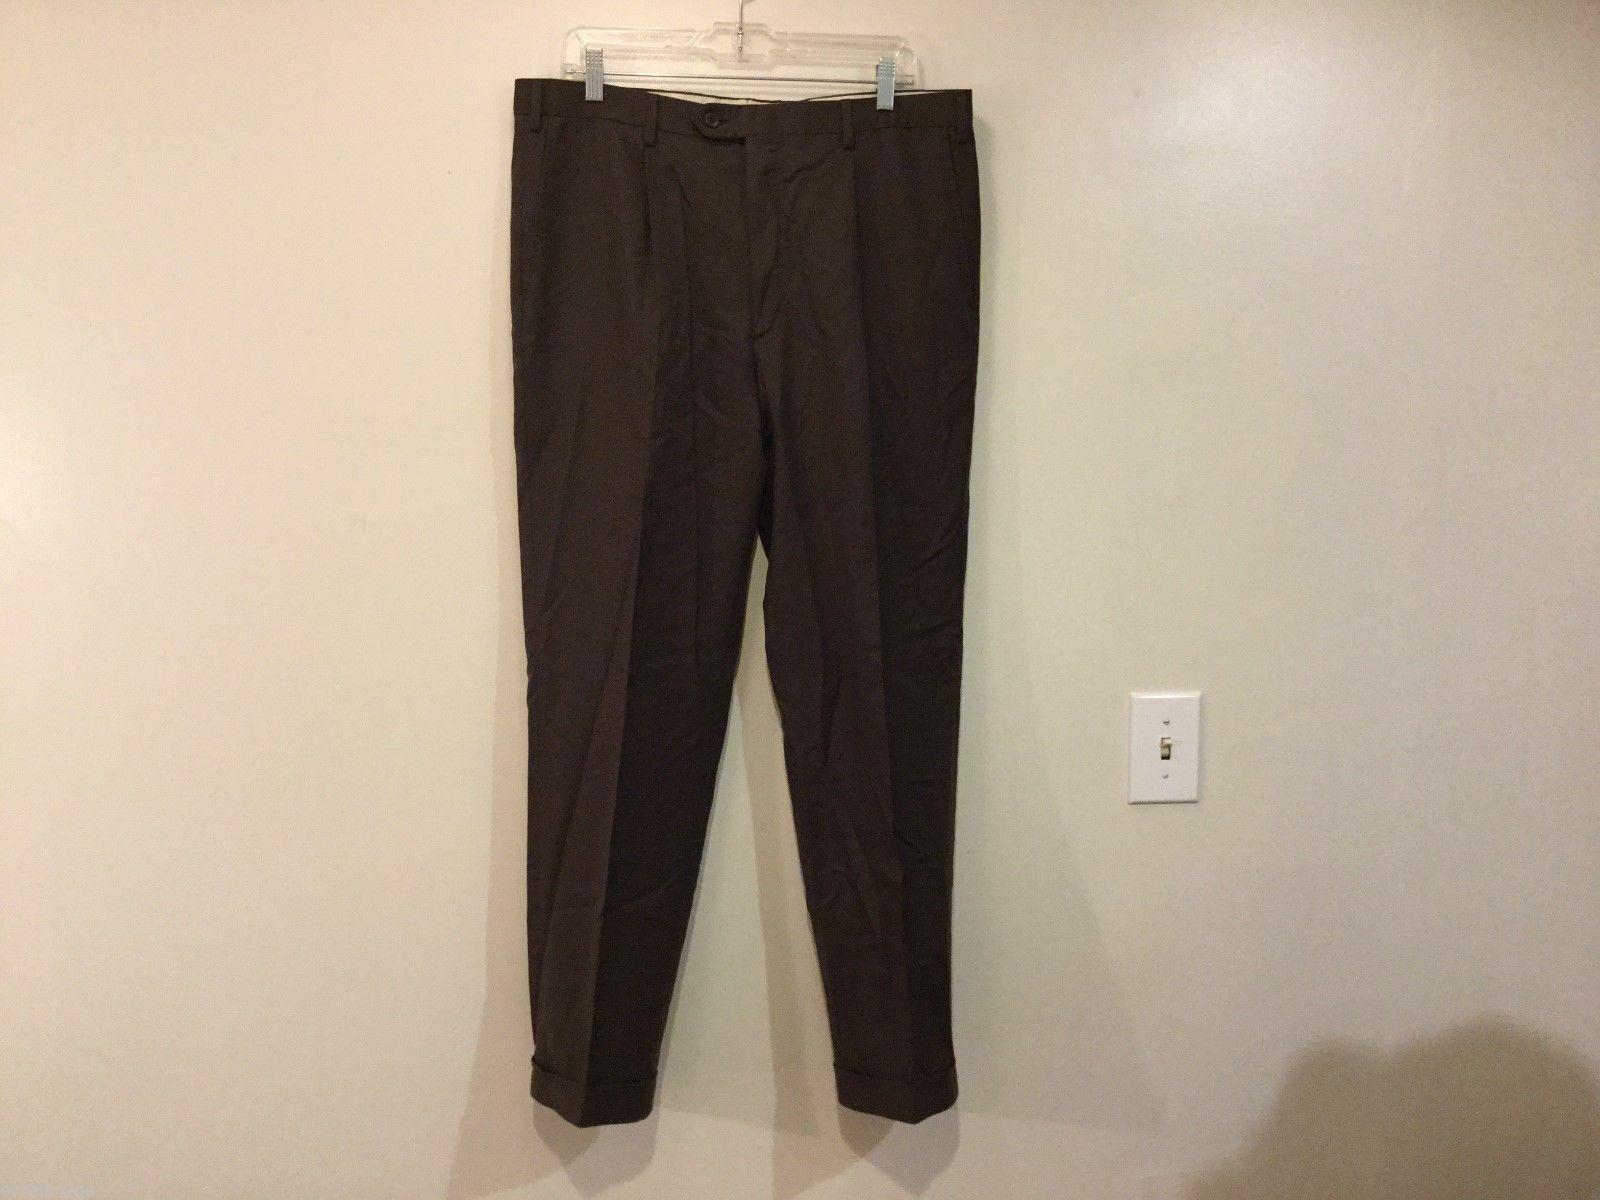 Brioni Mens Brown Dress Pants, Size 34